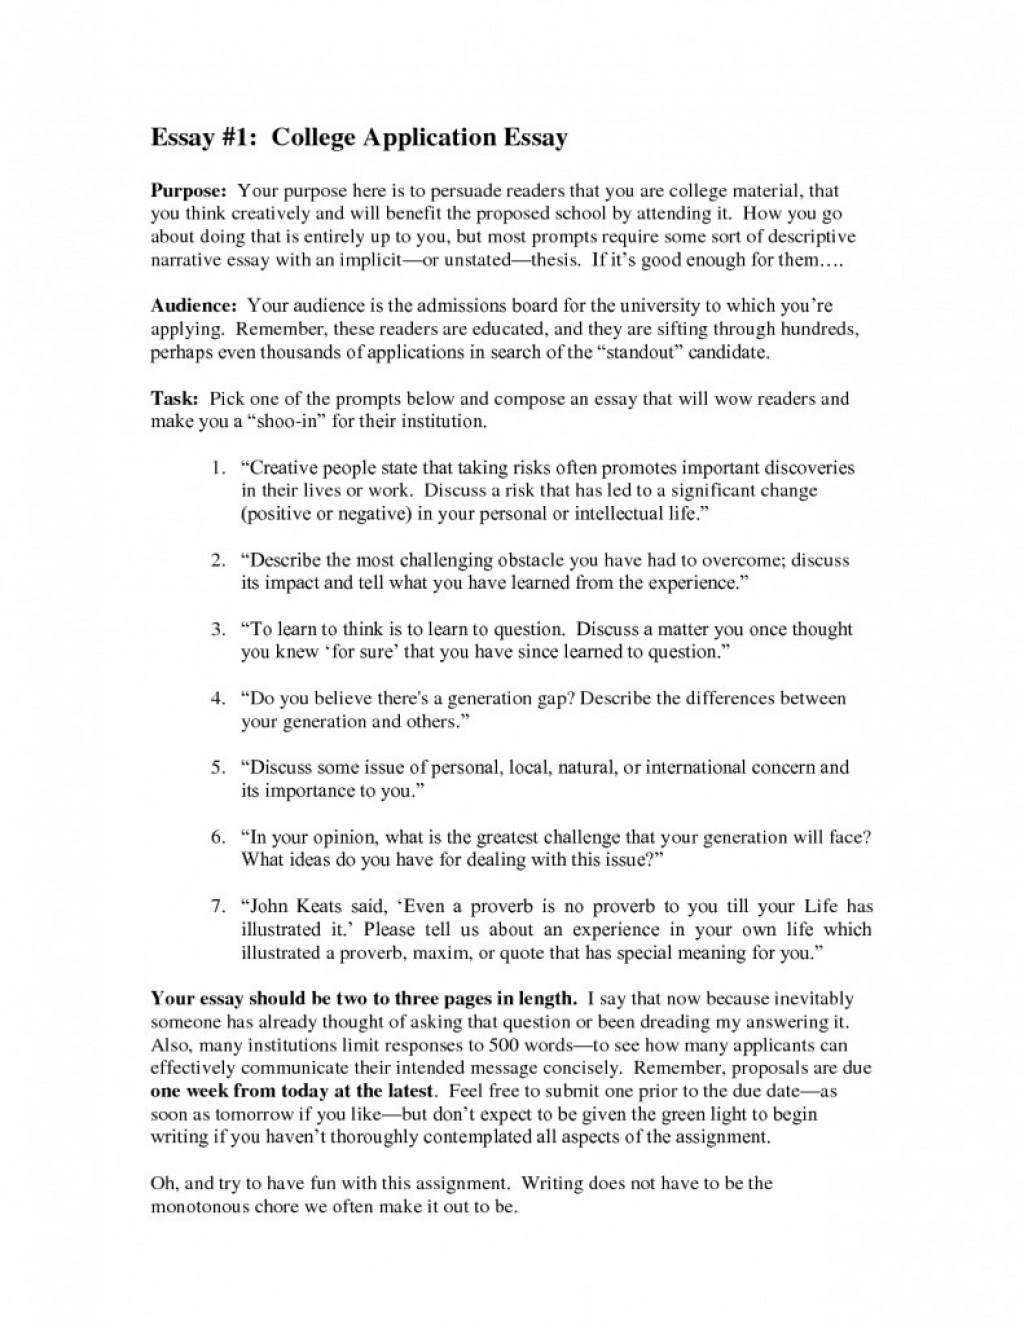 004 College Application Essay 791x1024 Writing Imposing Service Reddit Custom Help Large